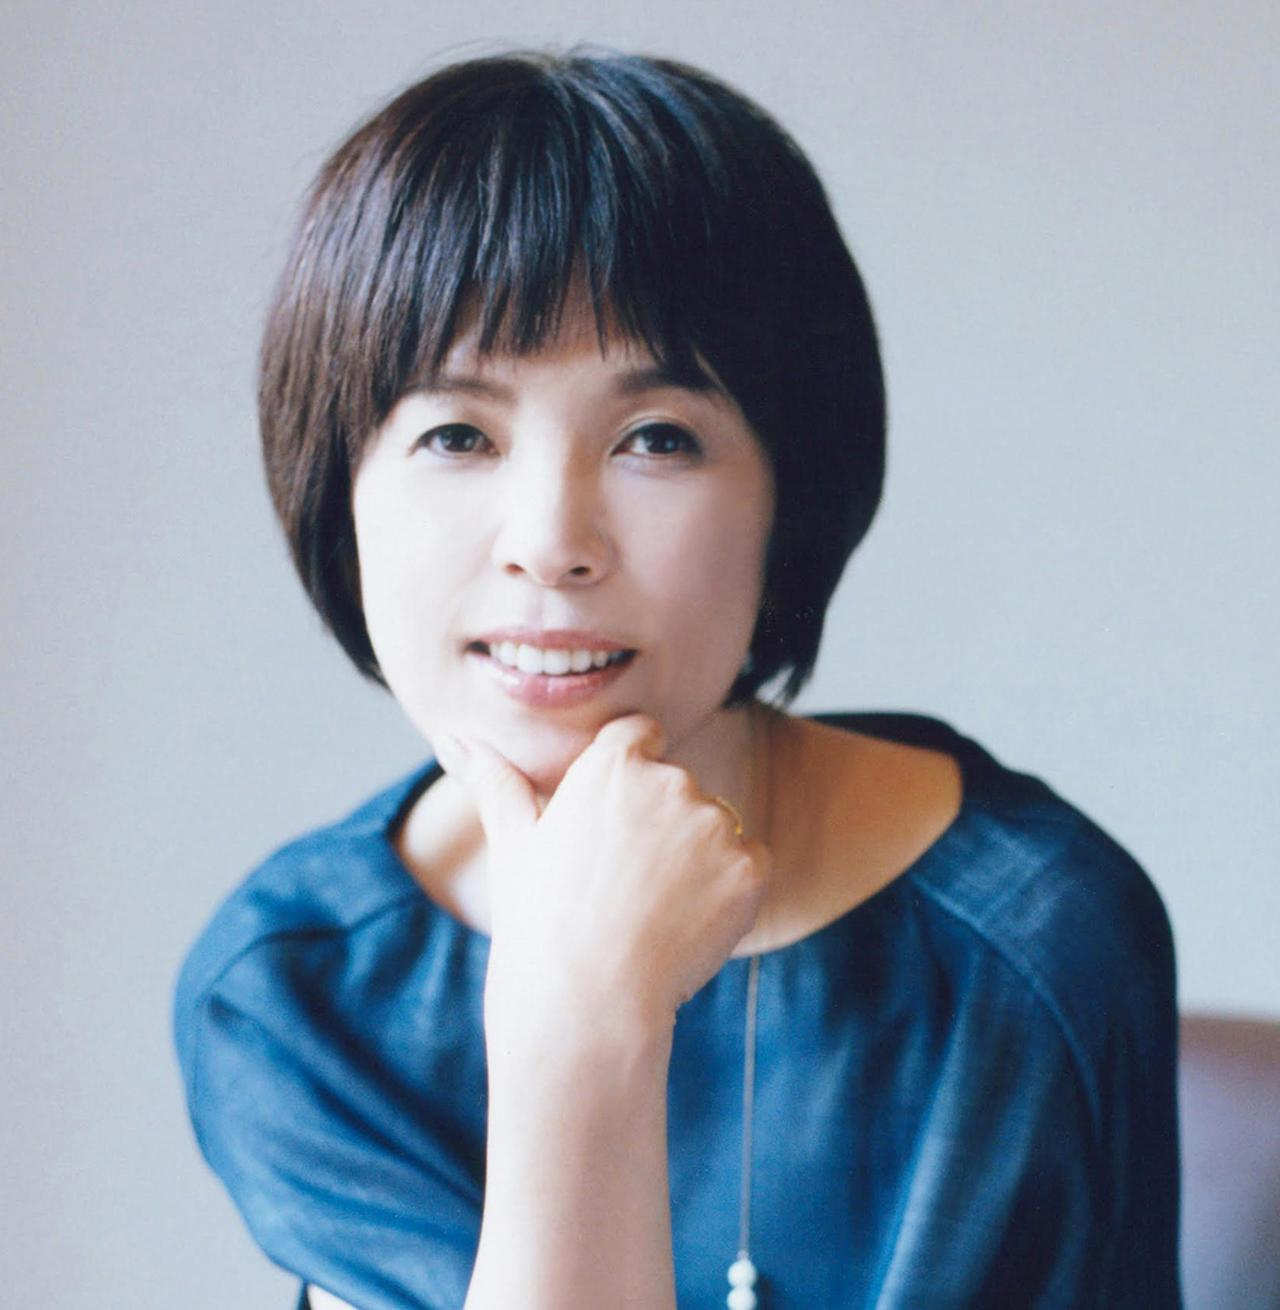 Images : 原田マハ